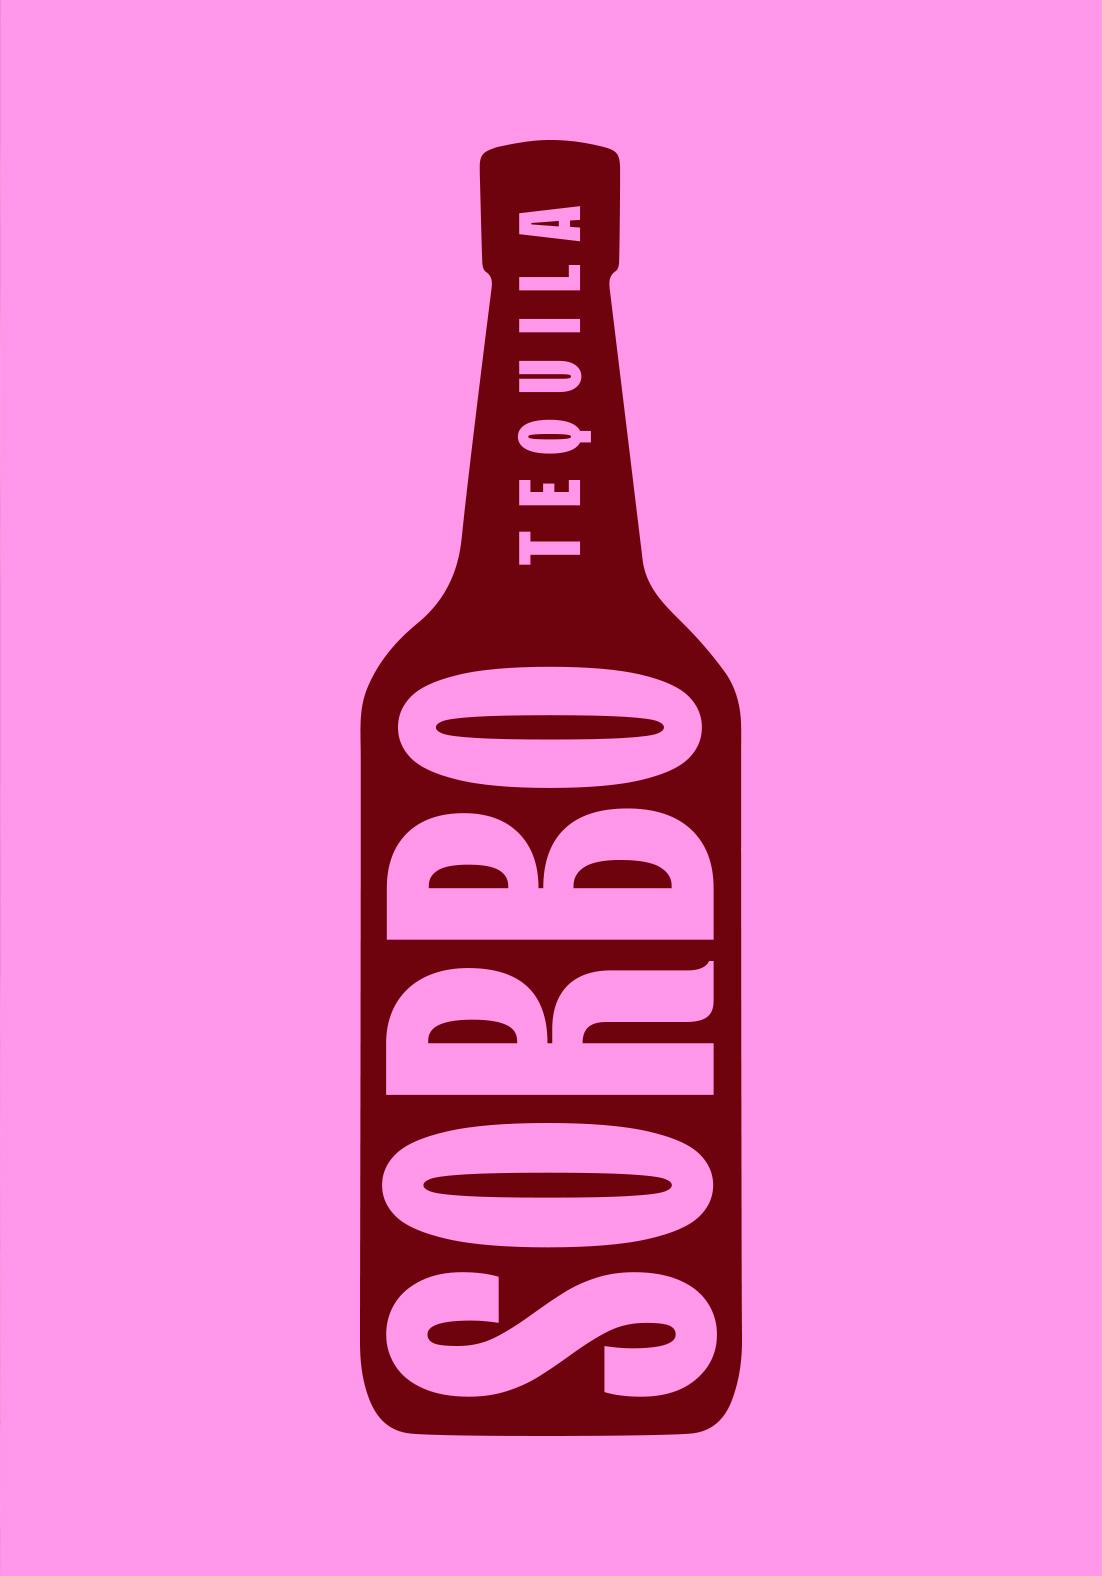 Sorbo Tequila Bottle Type Design